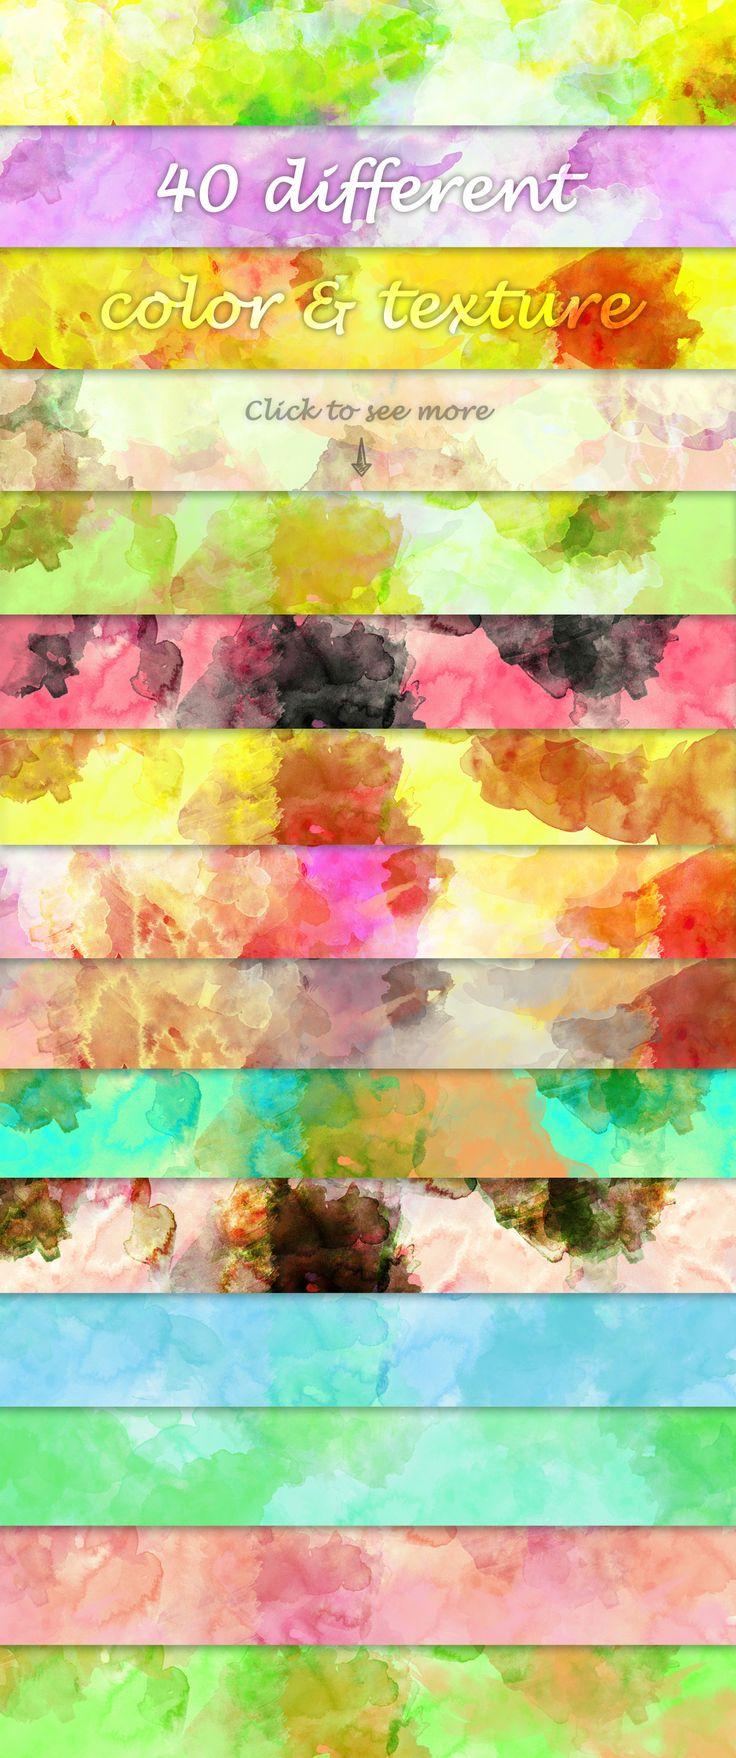 https://creativemarket.com/vito12/98722-Watercolor-Textures - Watercolor Textures